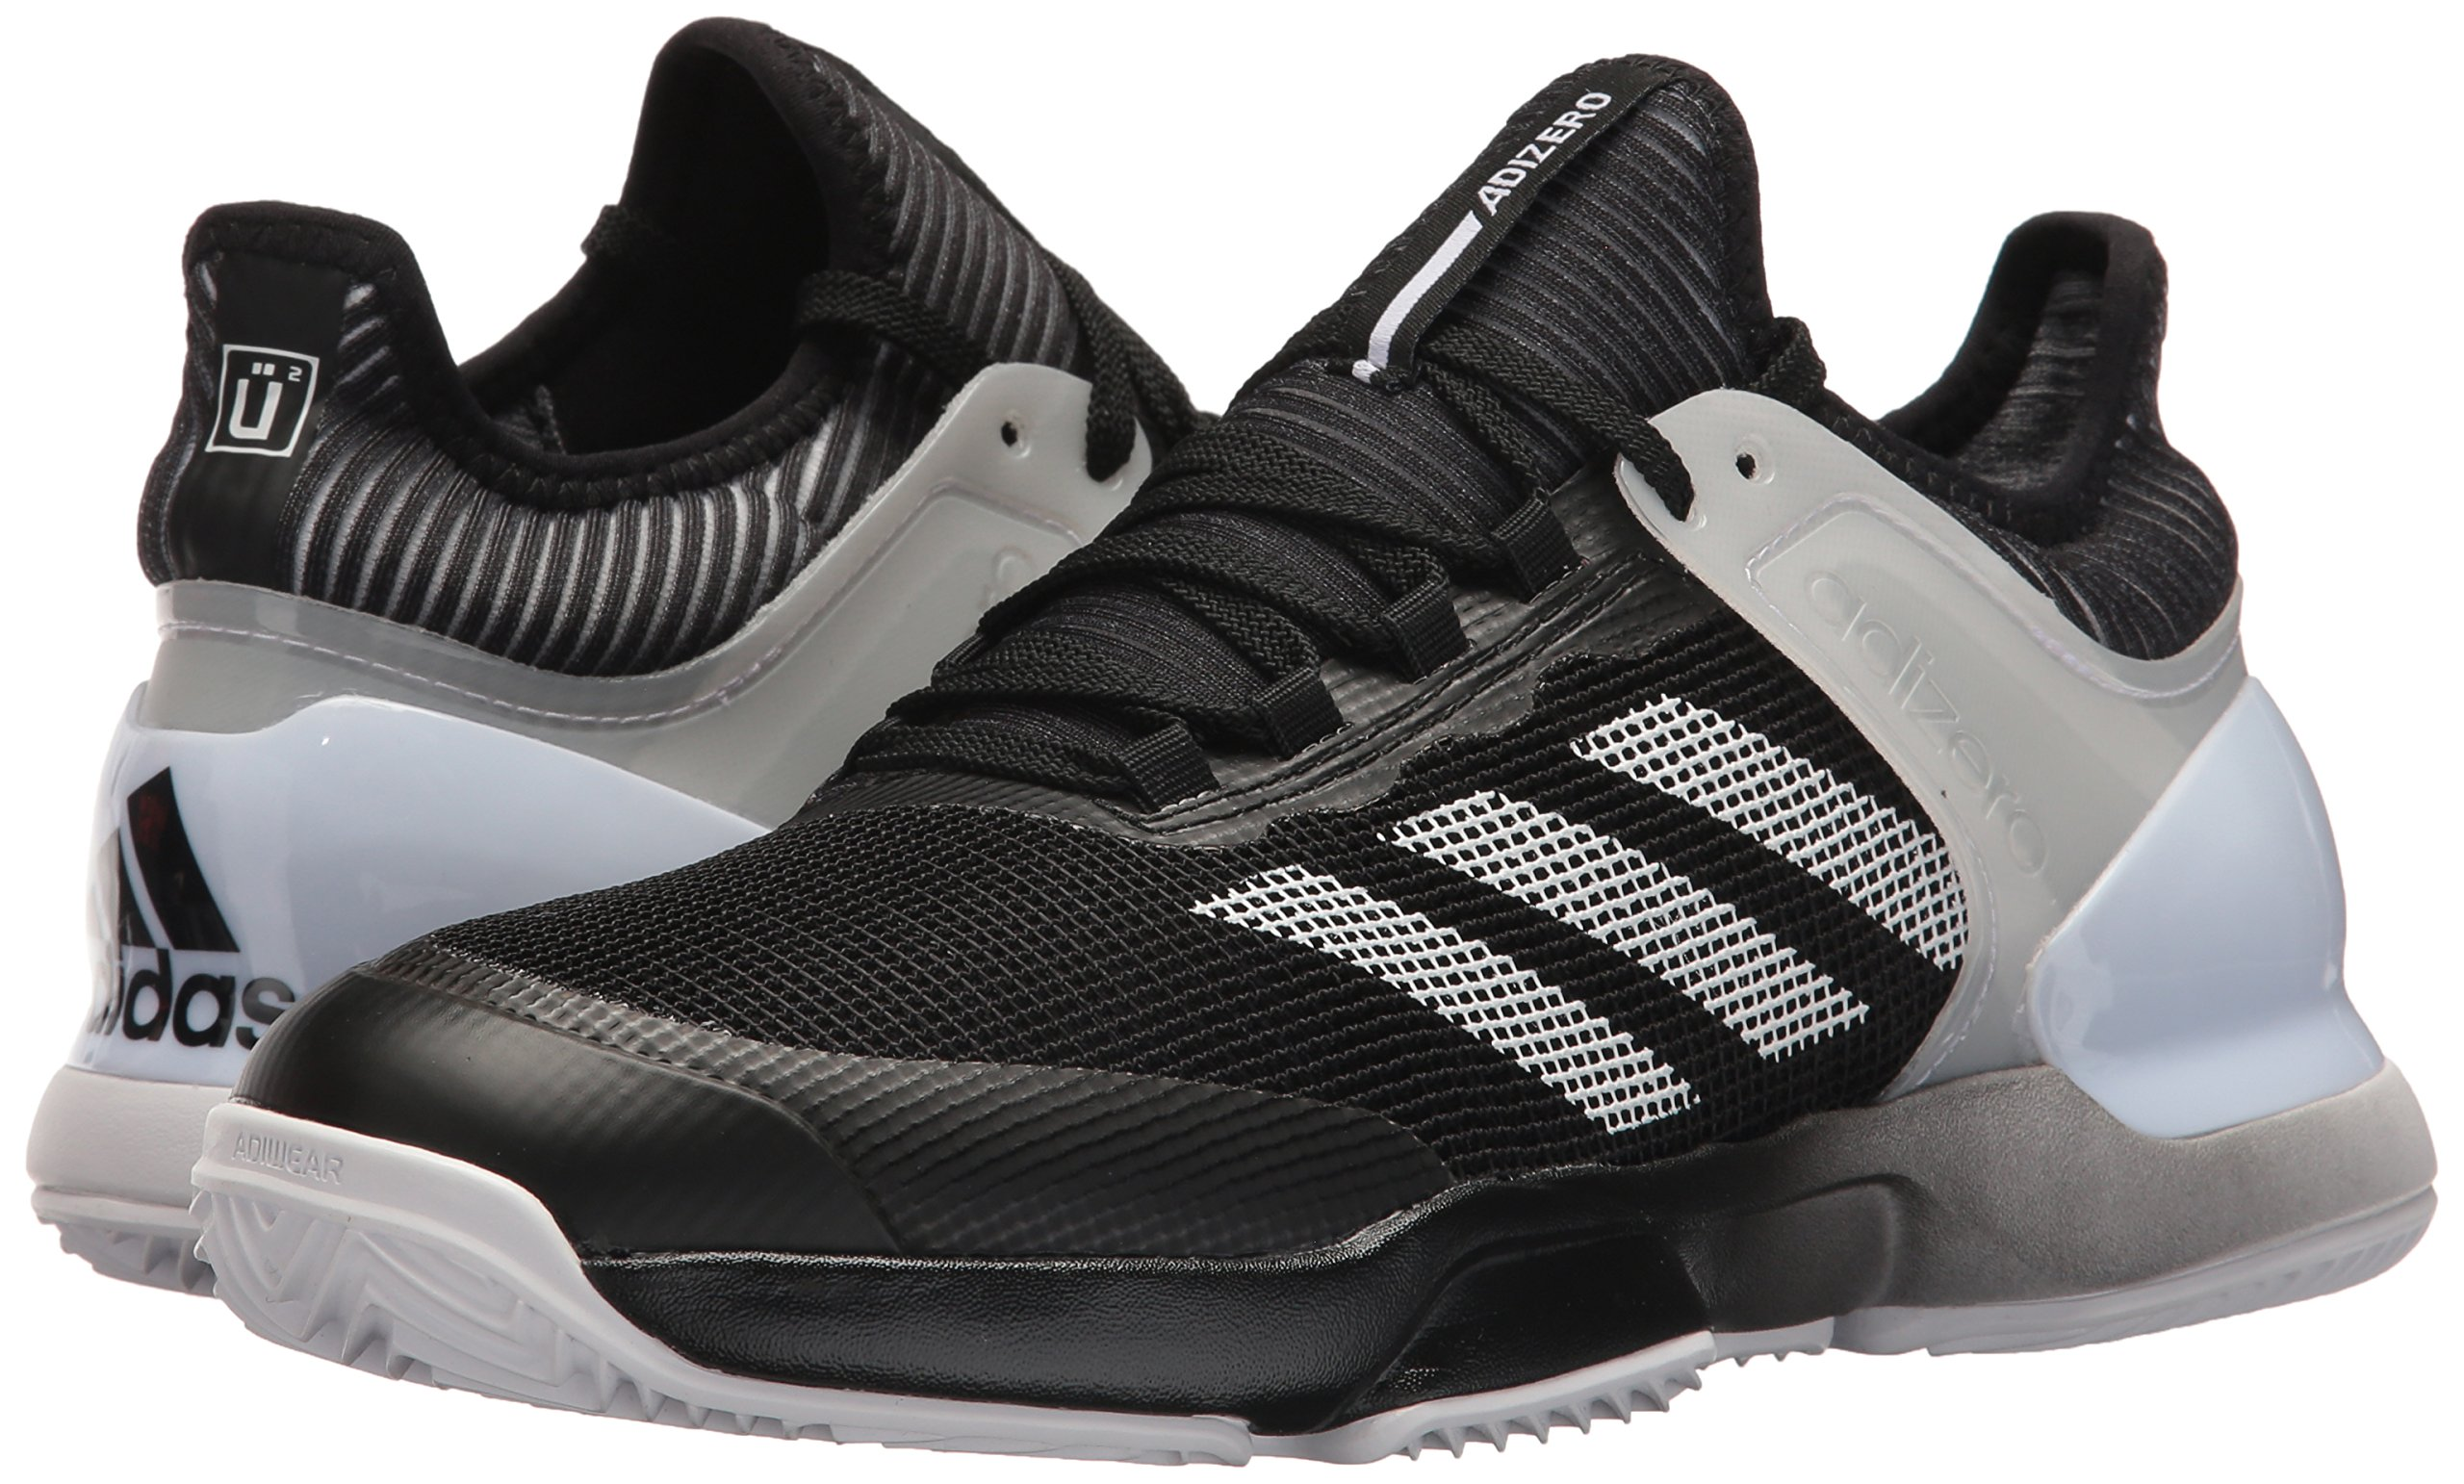 adidas Men's Adizero Ubersonic 2 Clay Tennis Shoe